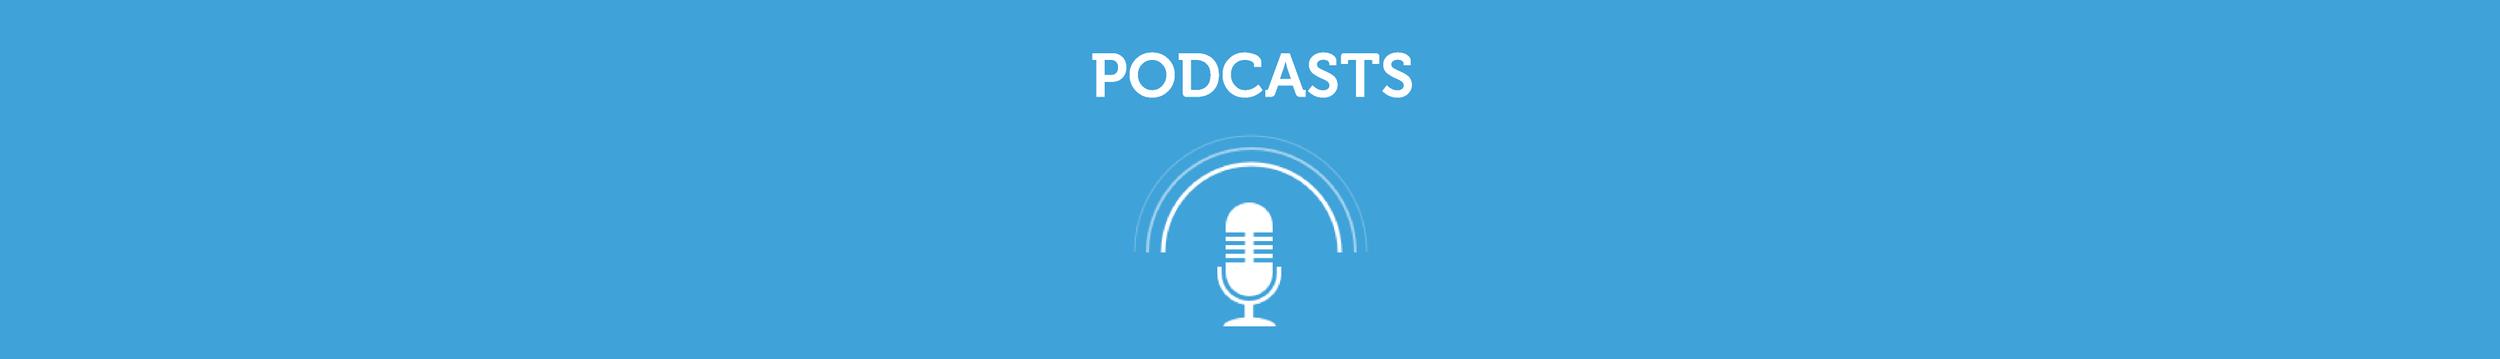 podcasts plz-02.png